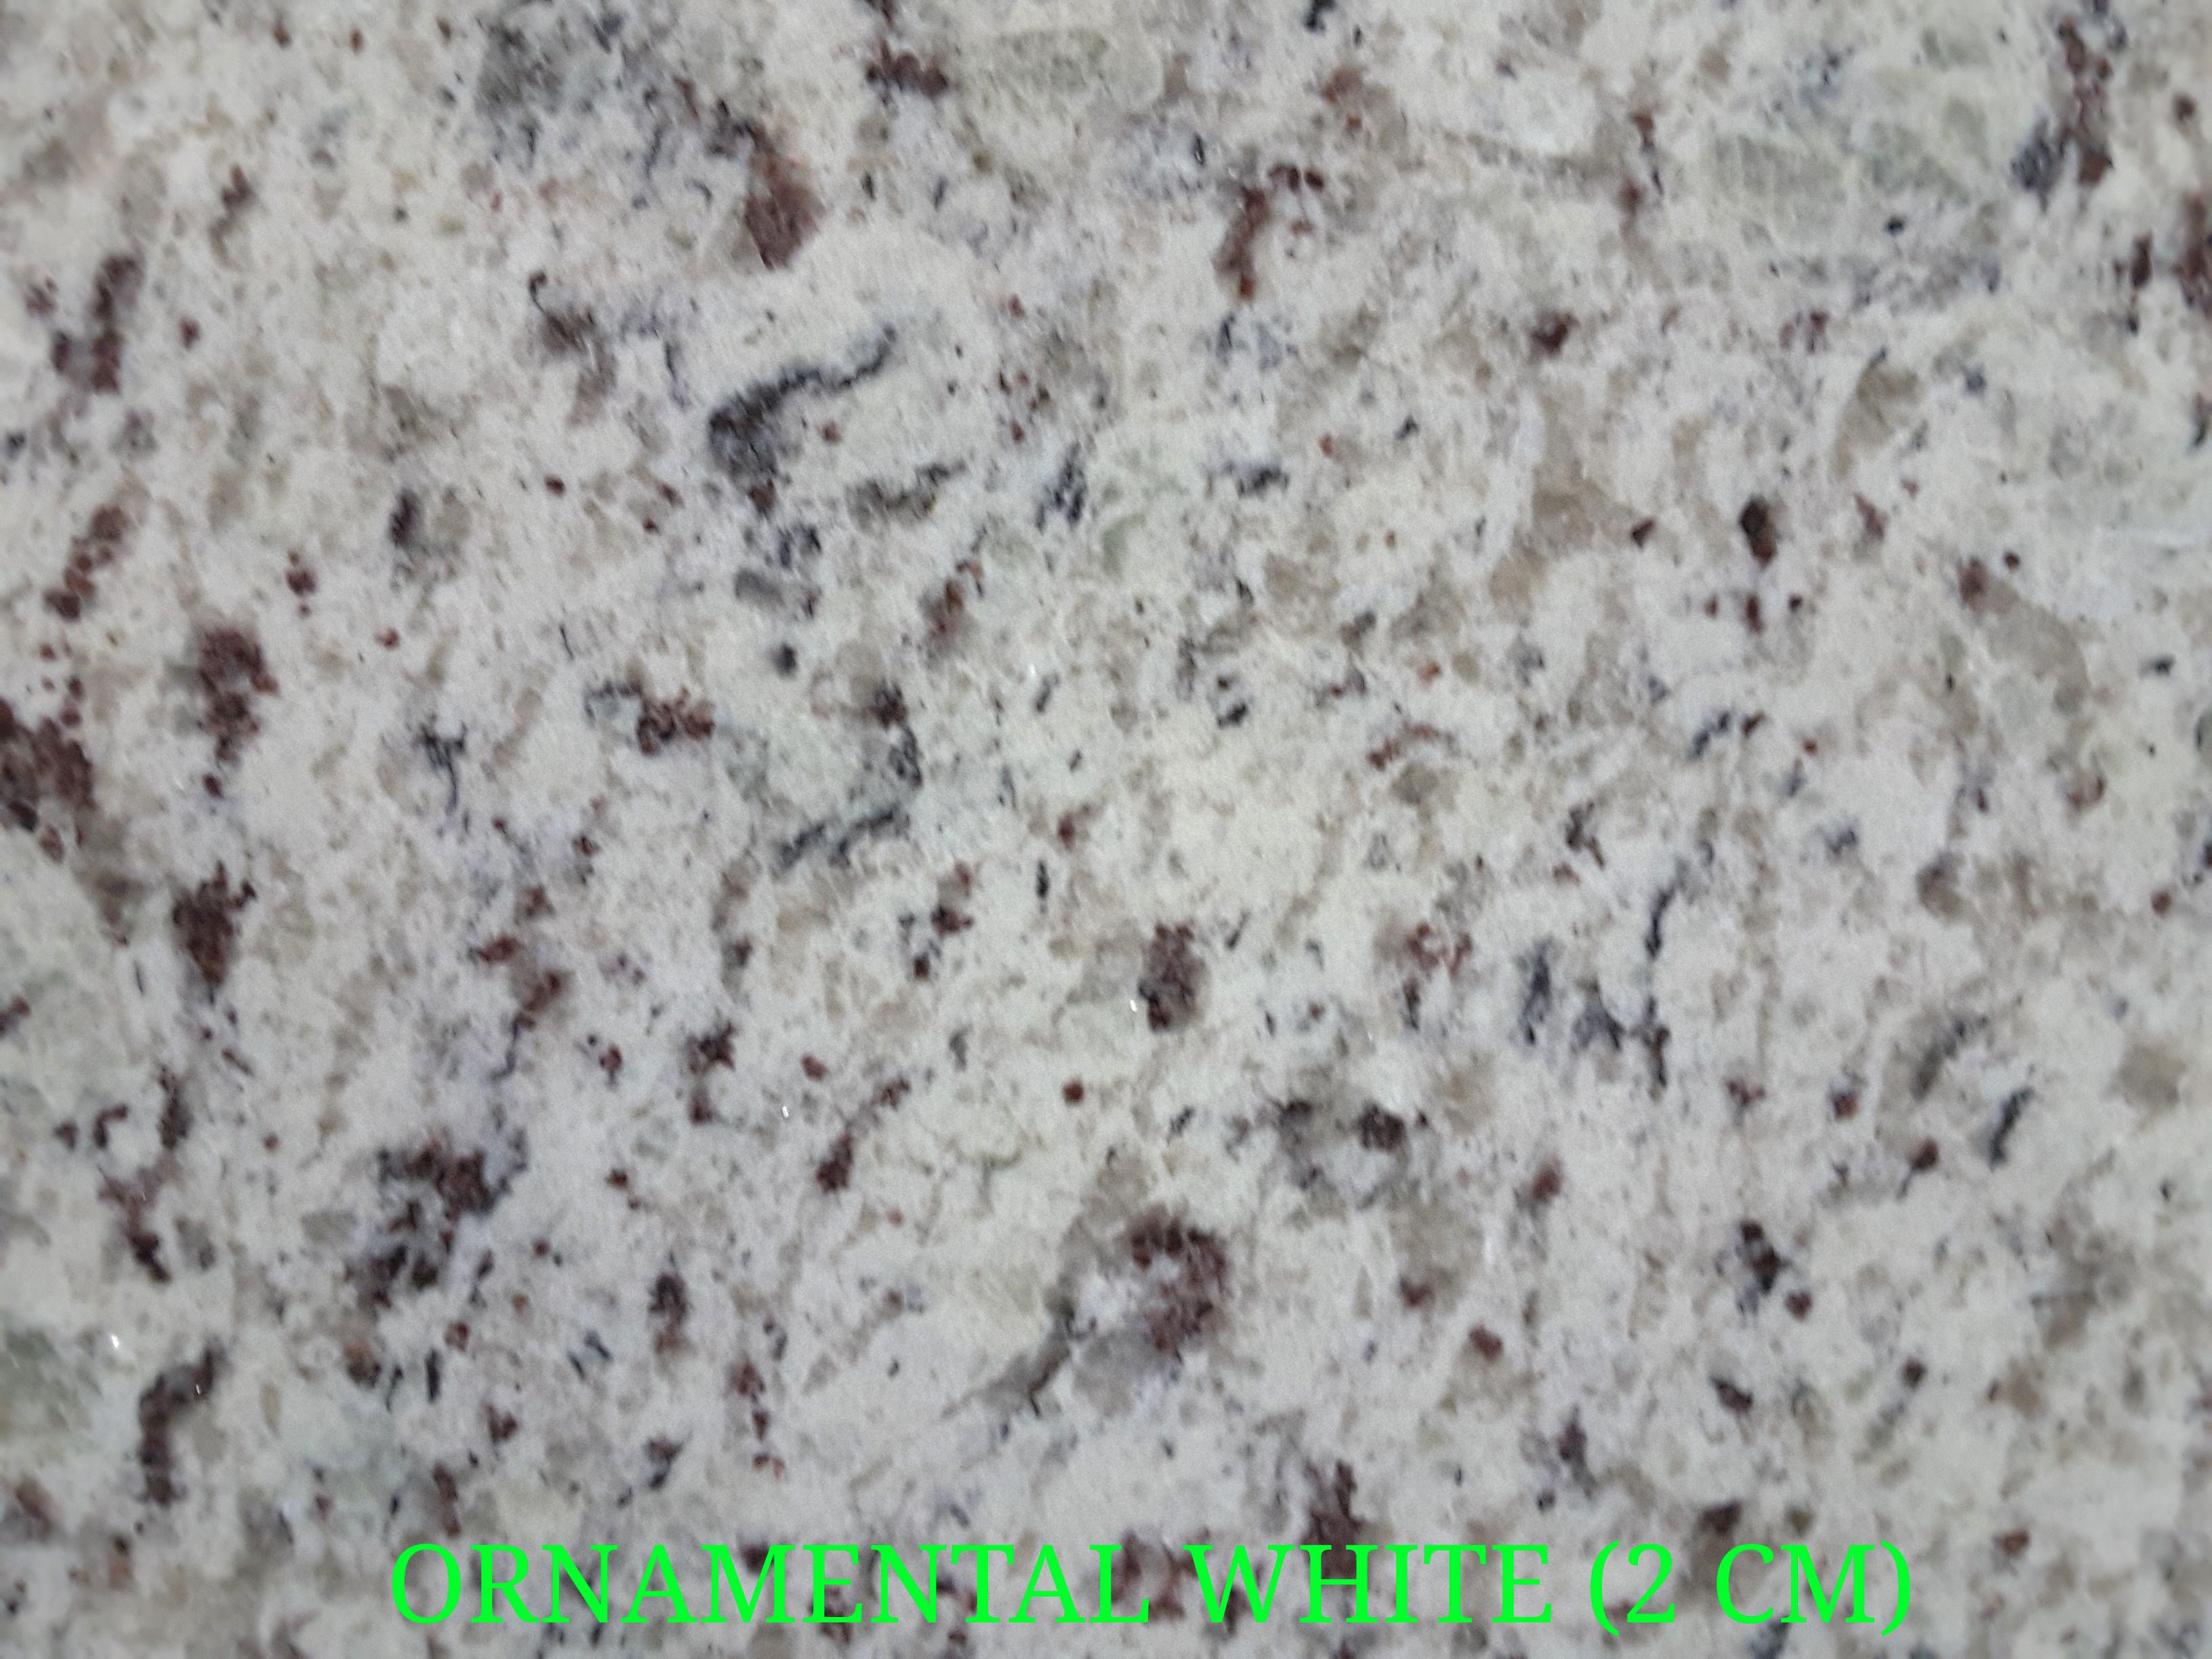 ORNAMENTAL WHITE (2 CM)-2